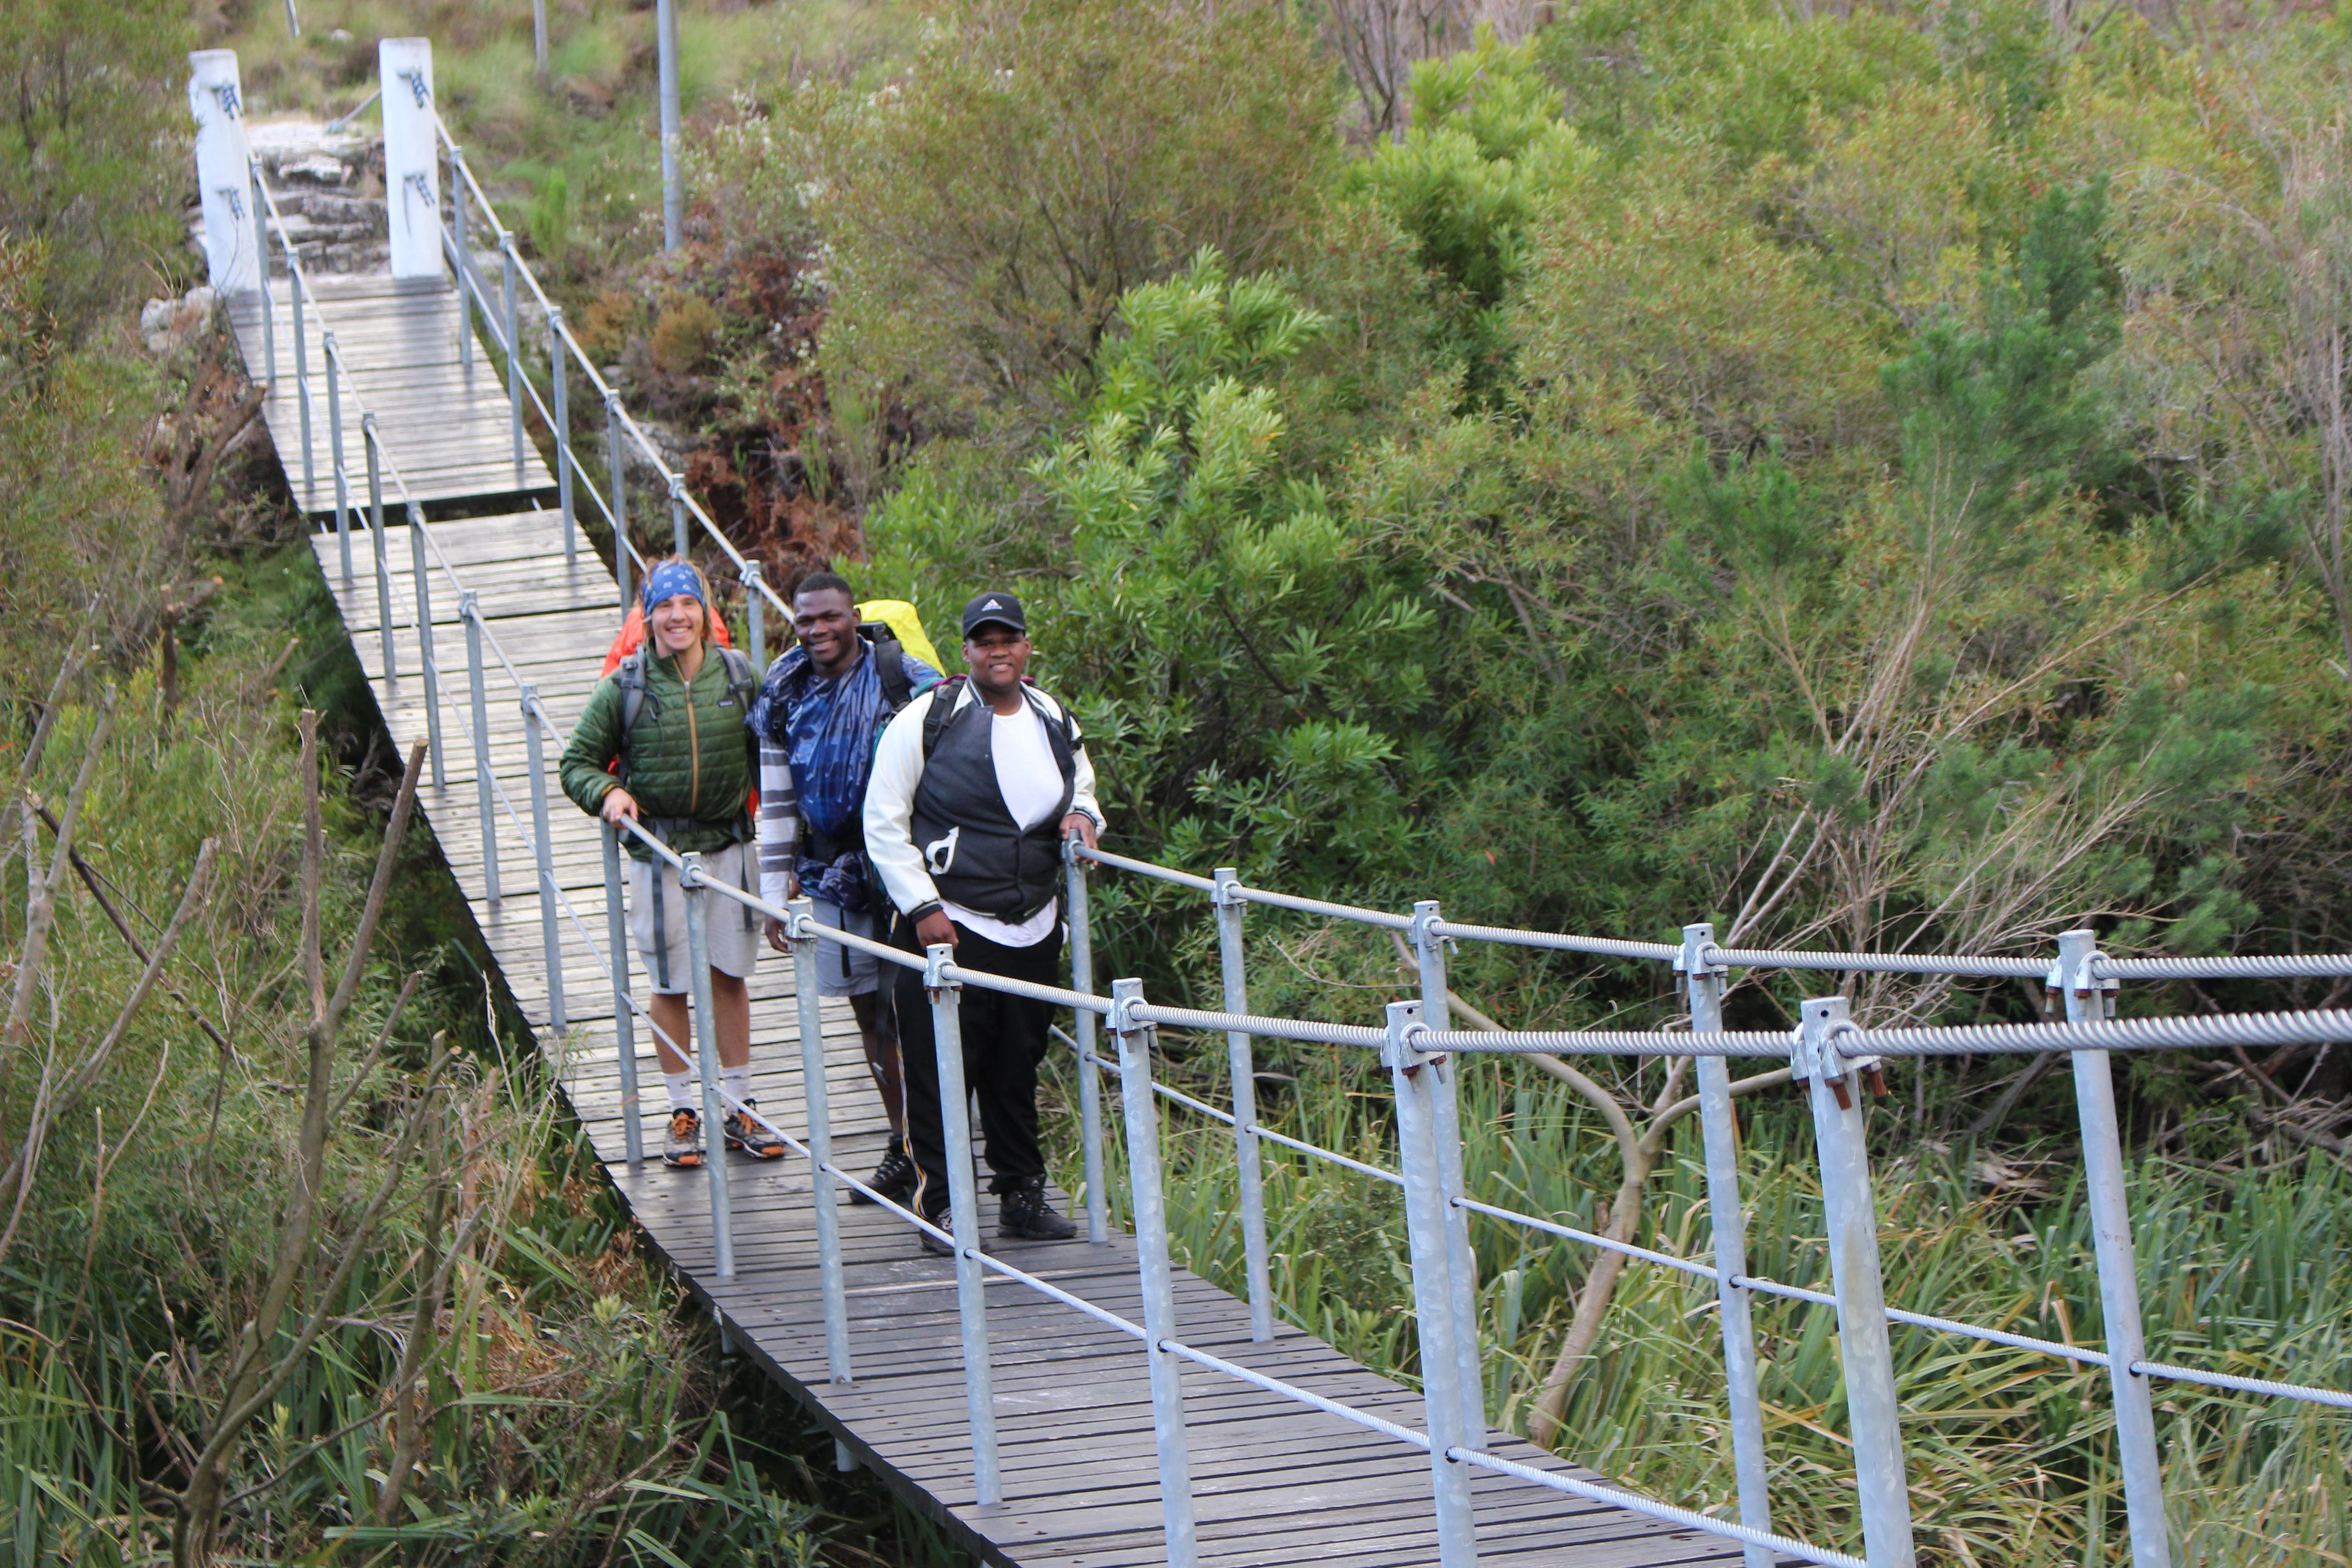 Summer Program - Career Exploration | Winterline: Leadership in Action Summer Program in South Africa